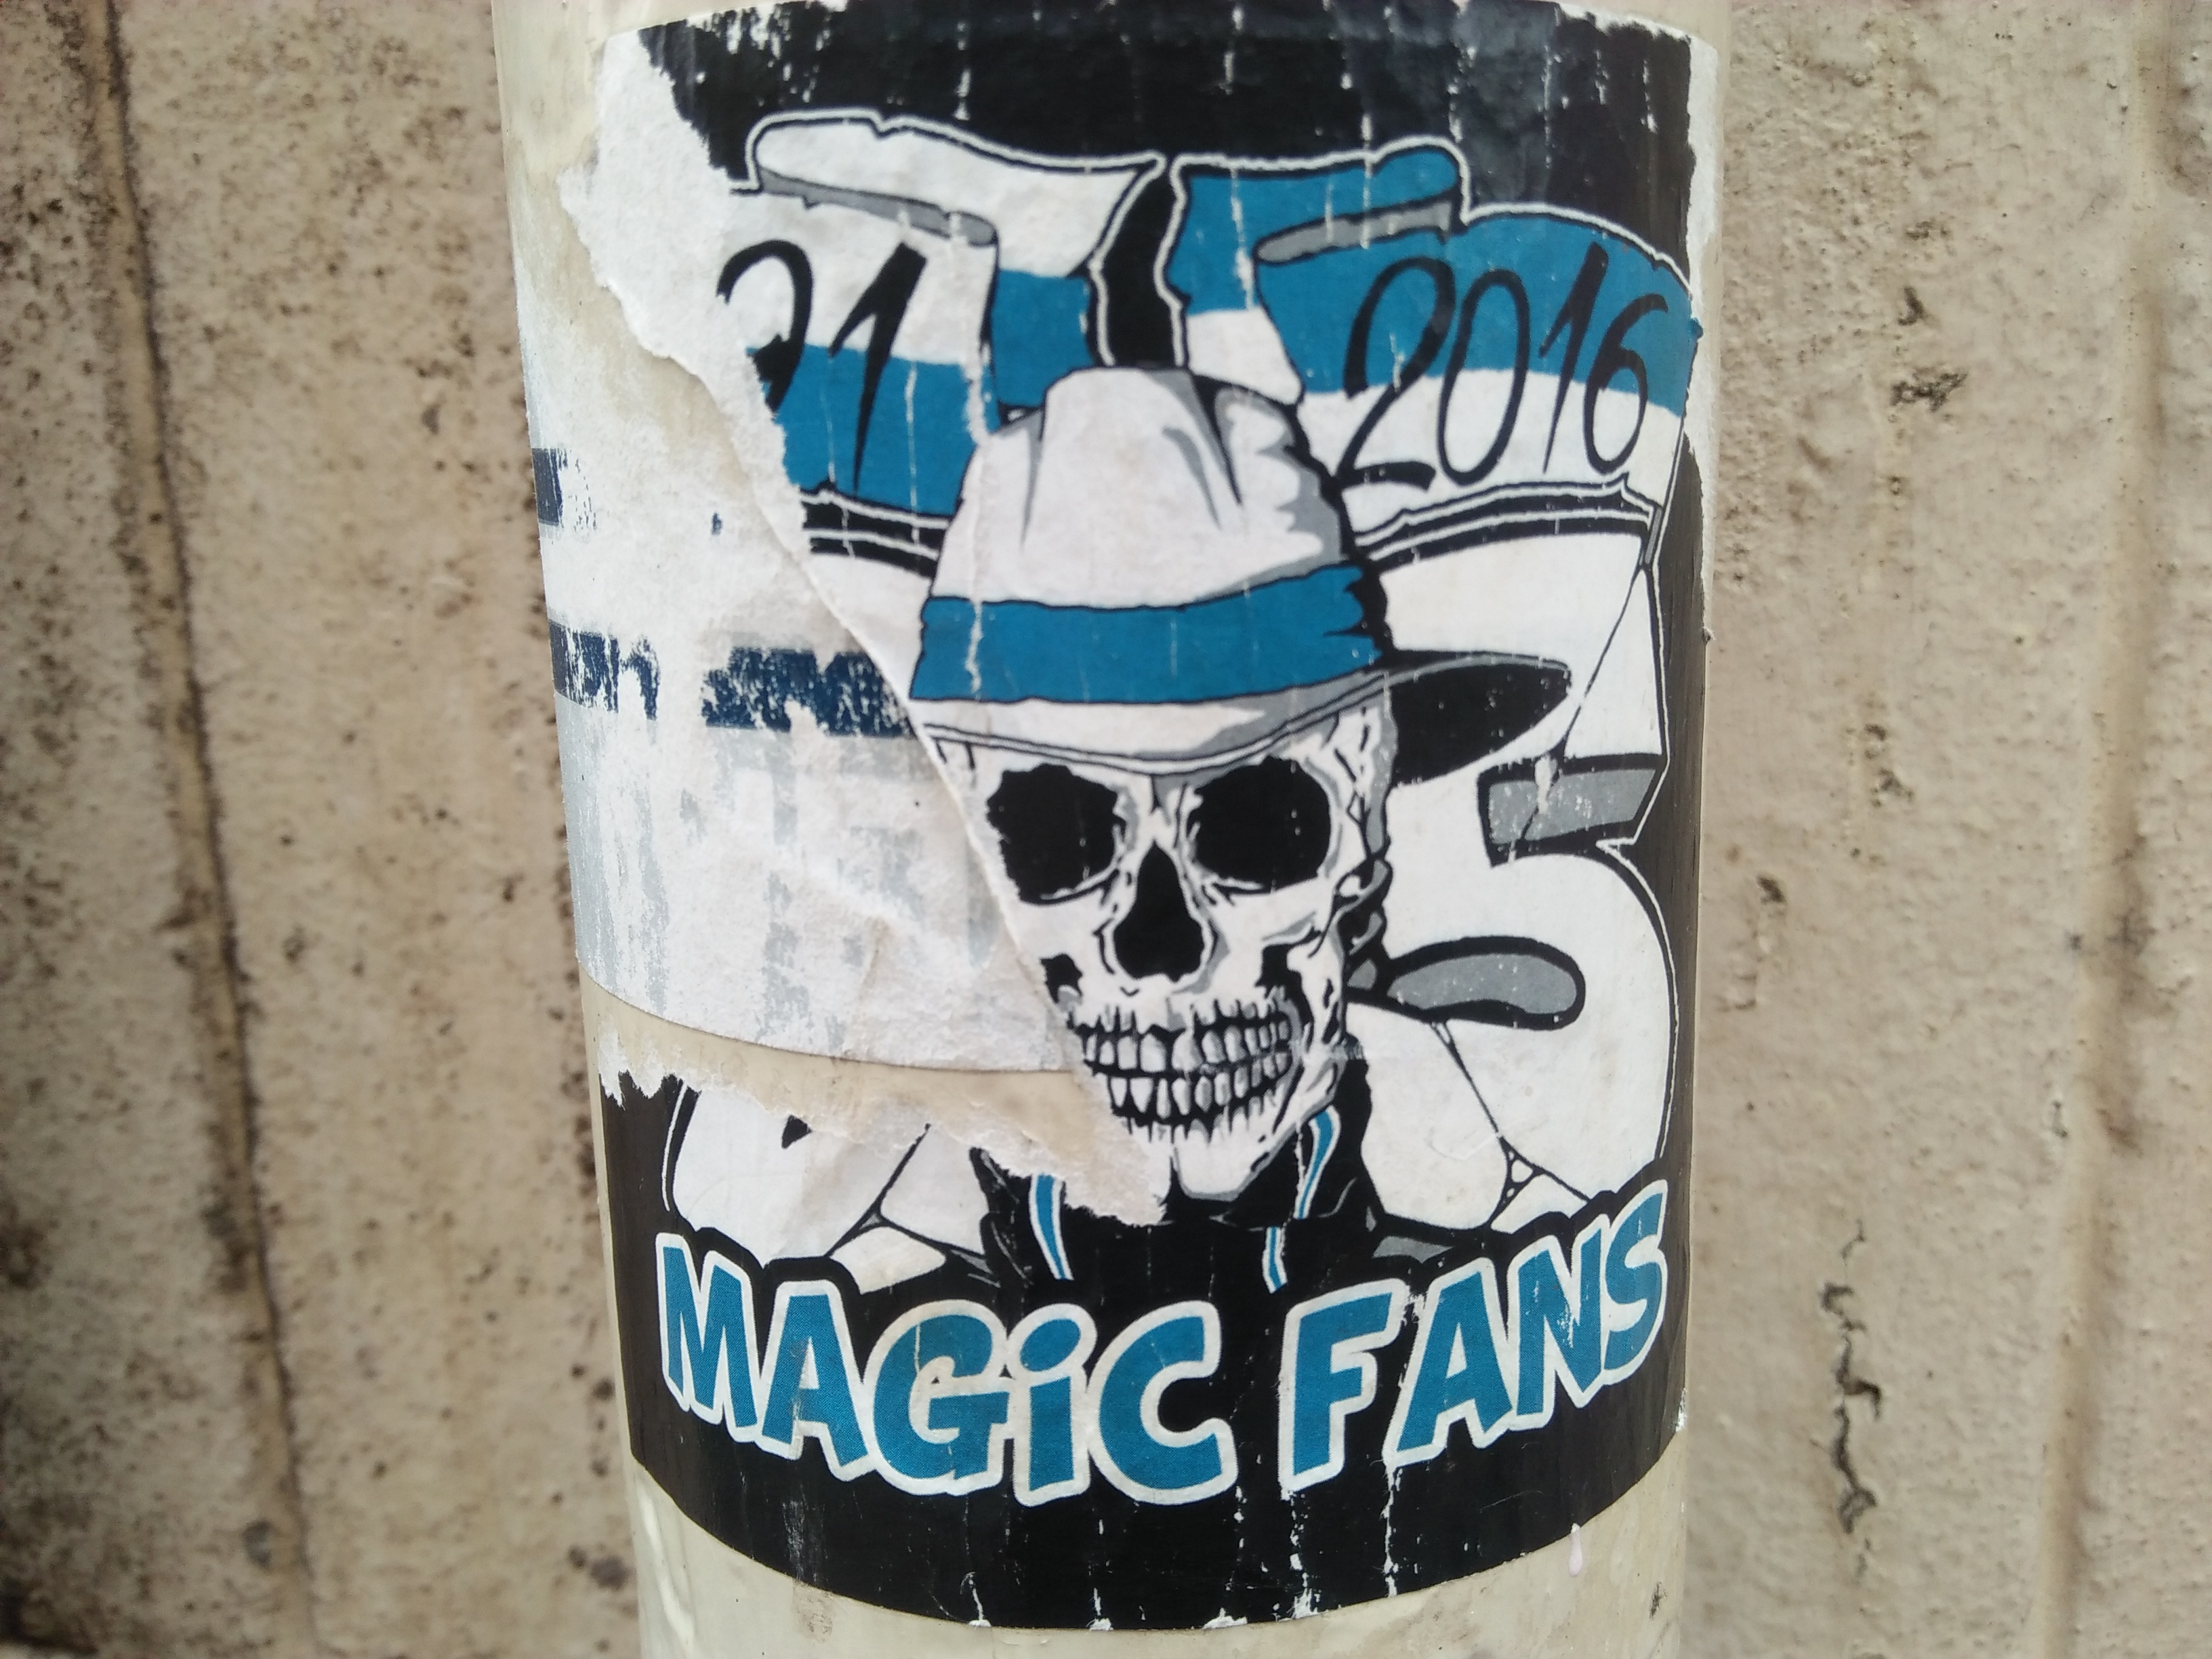 St Etienne Magic Fans Ultras